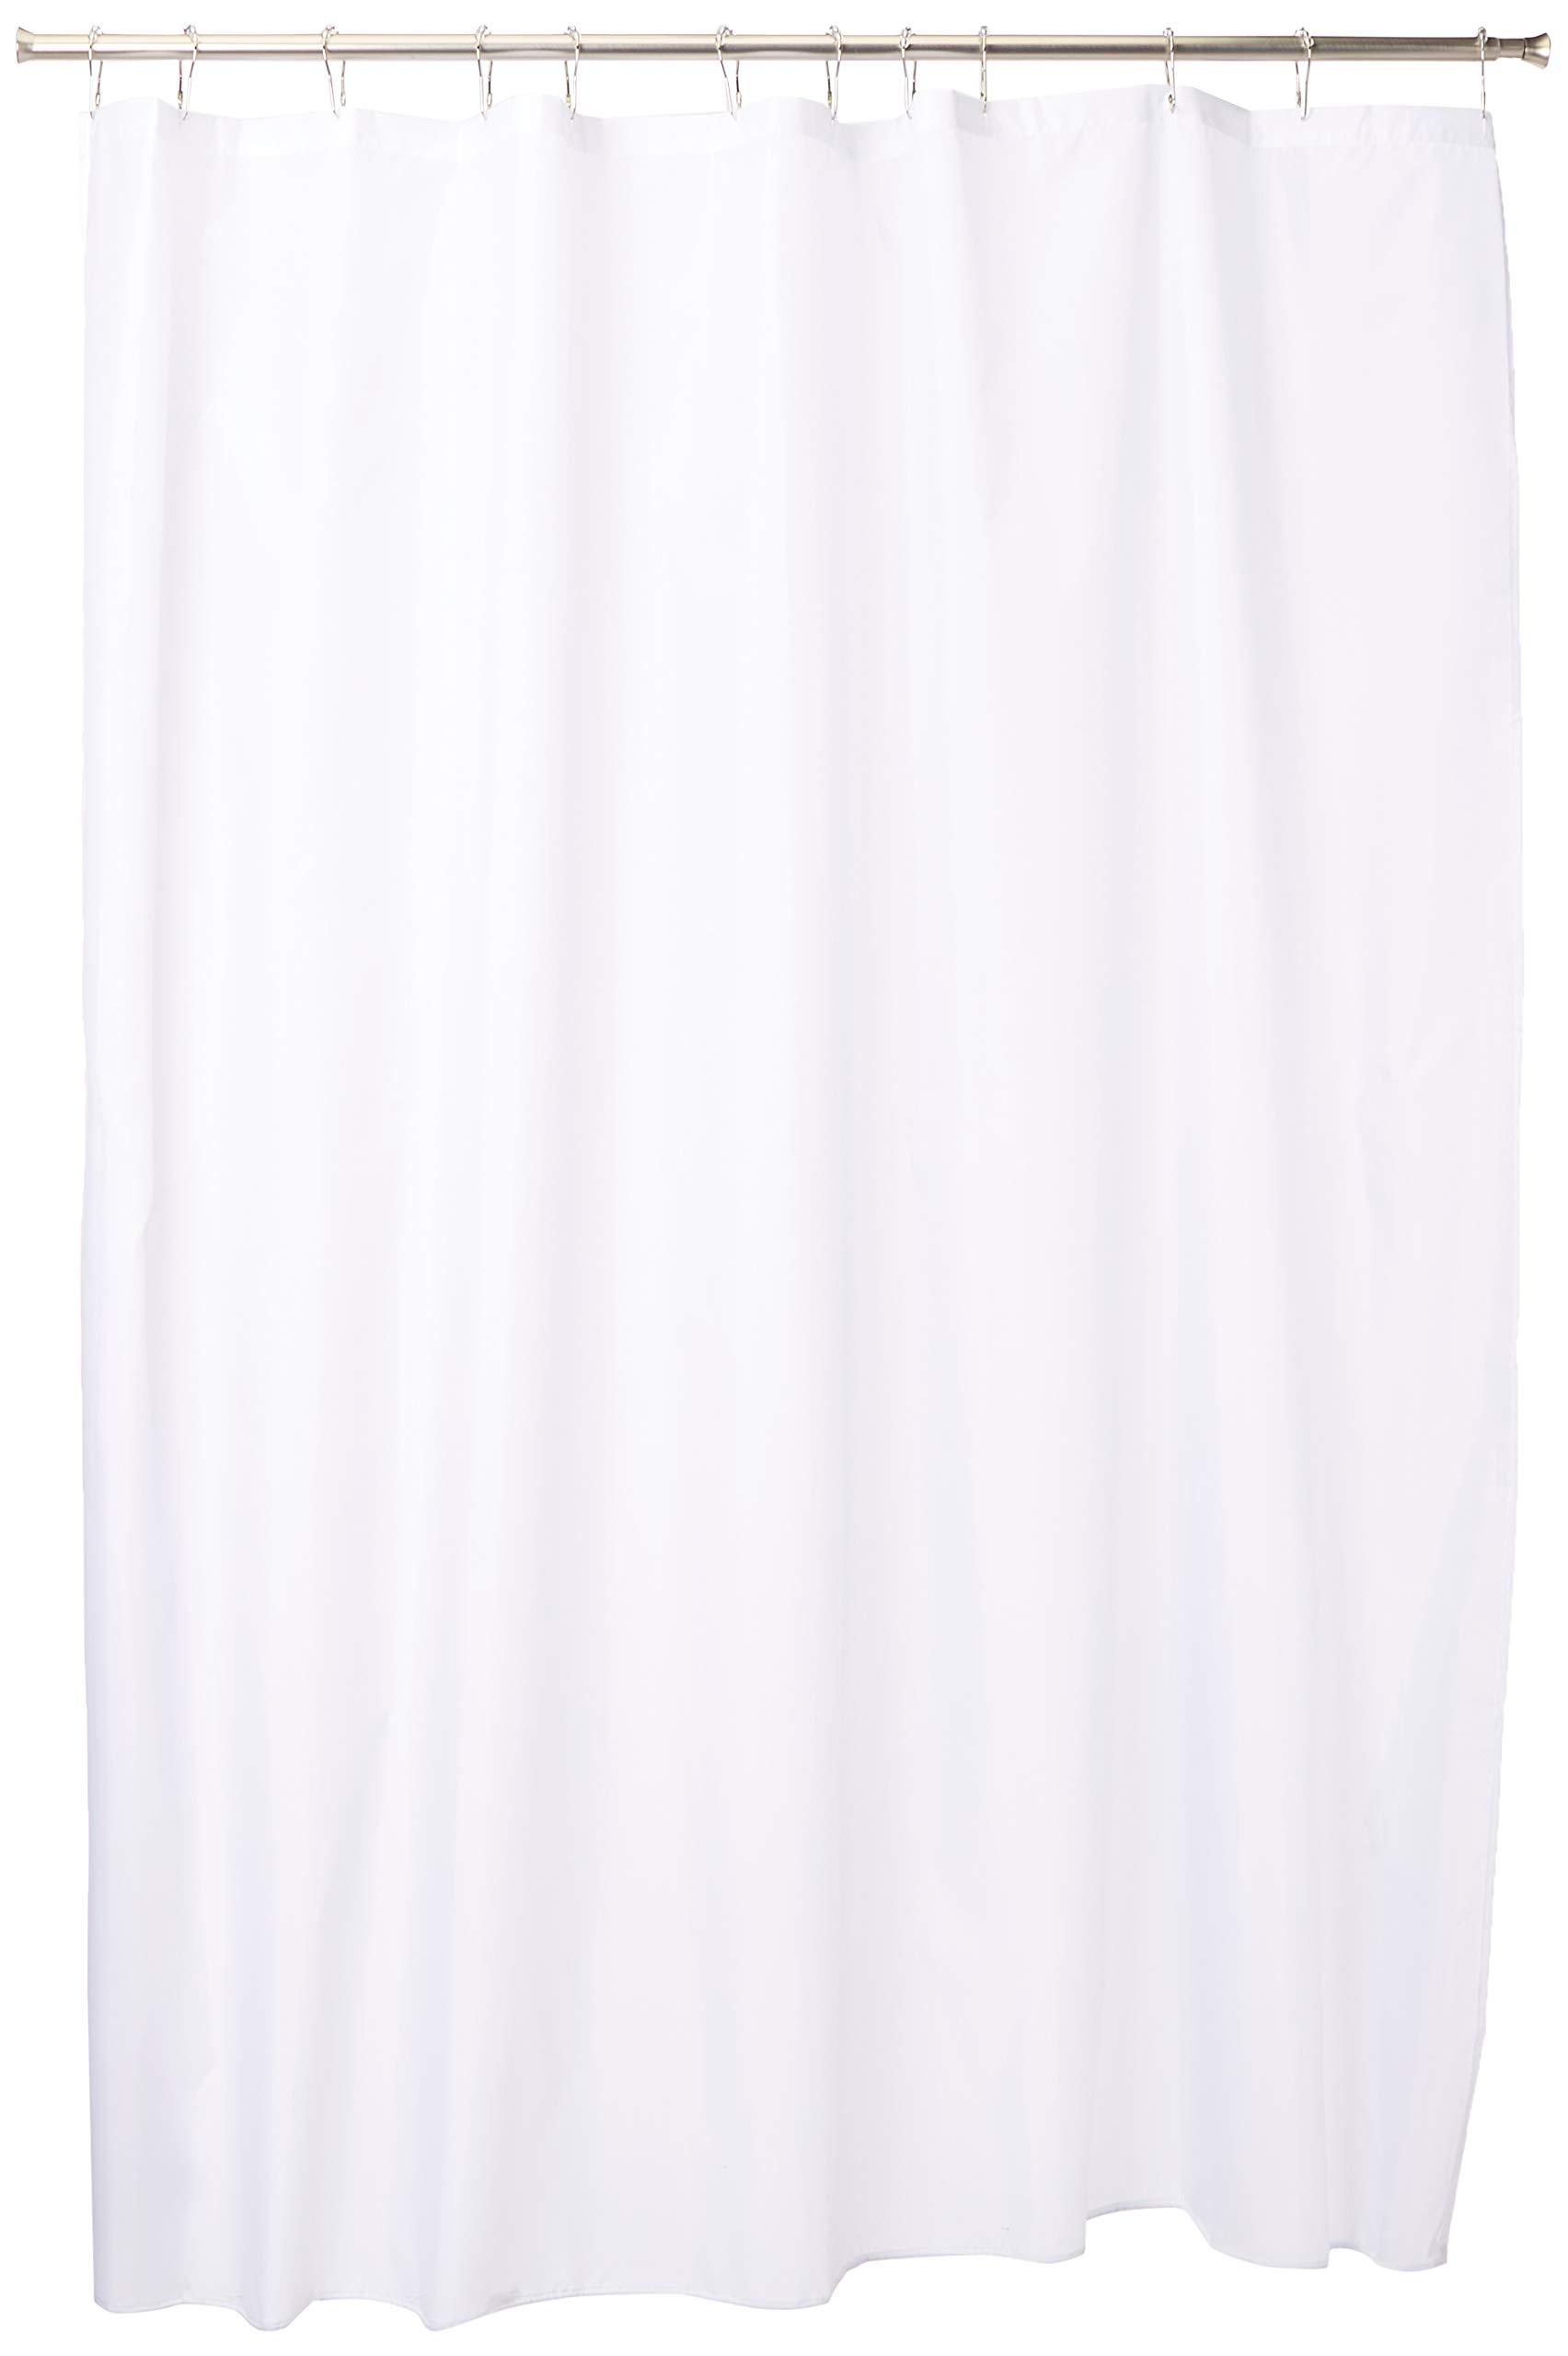 InterDesign 15062 White Extra Long Shower Curtain Liner